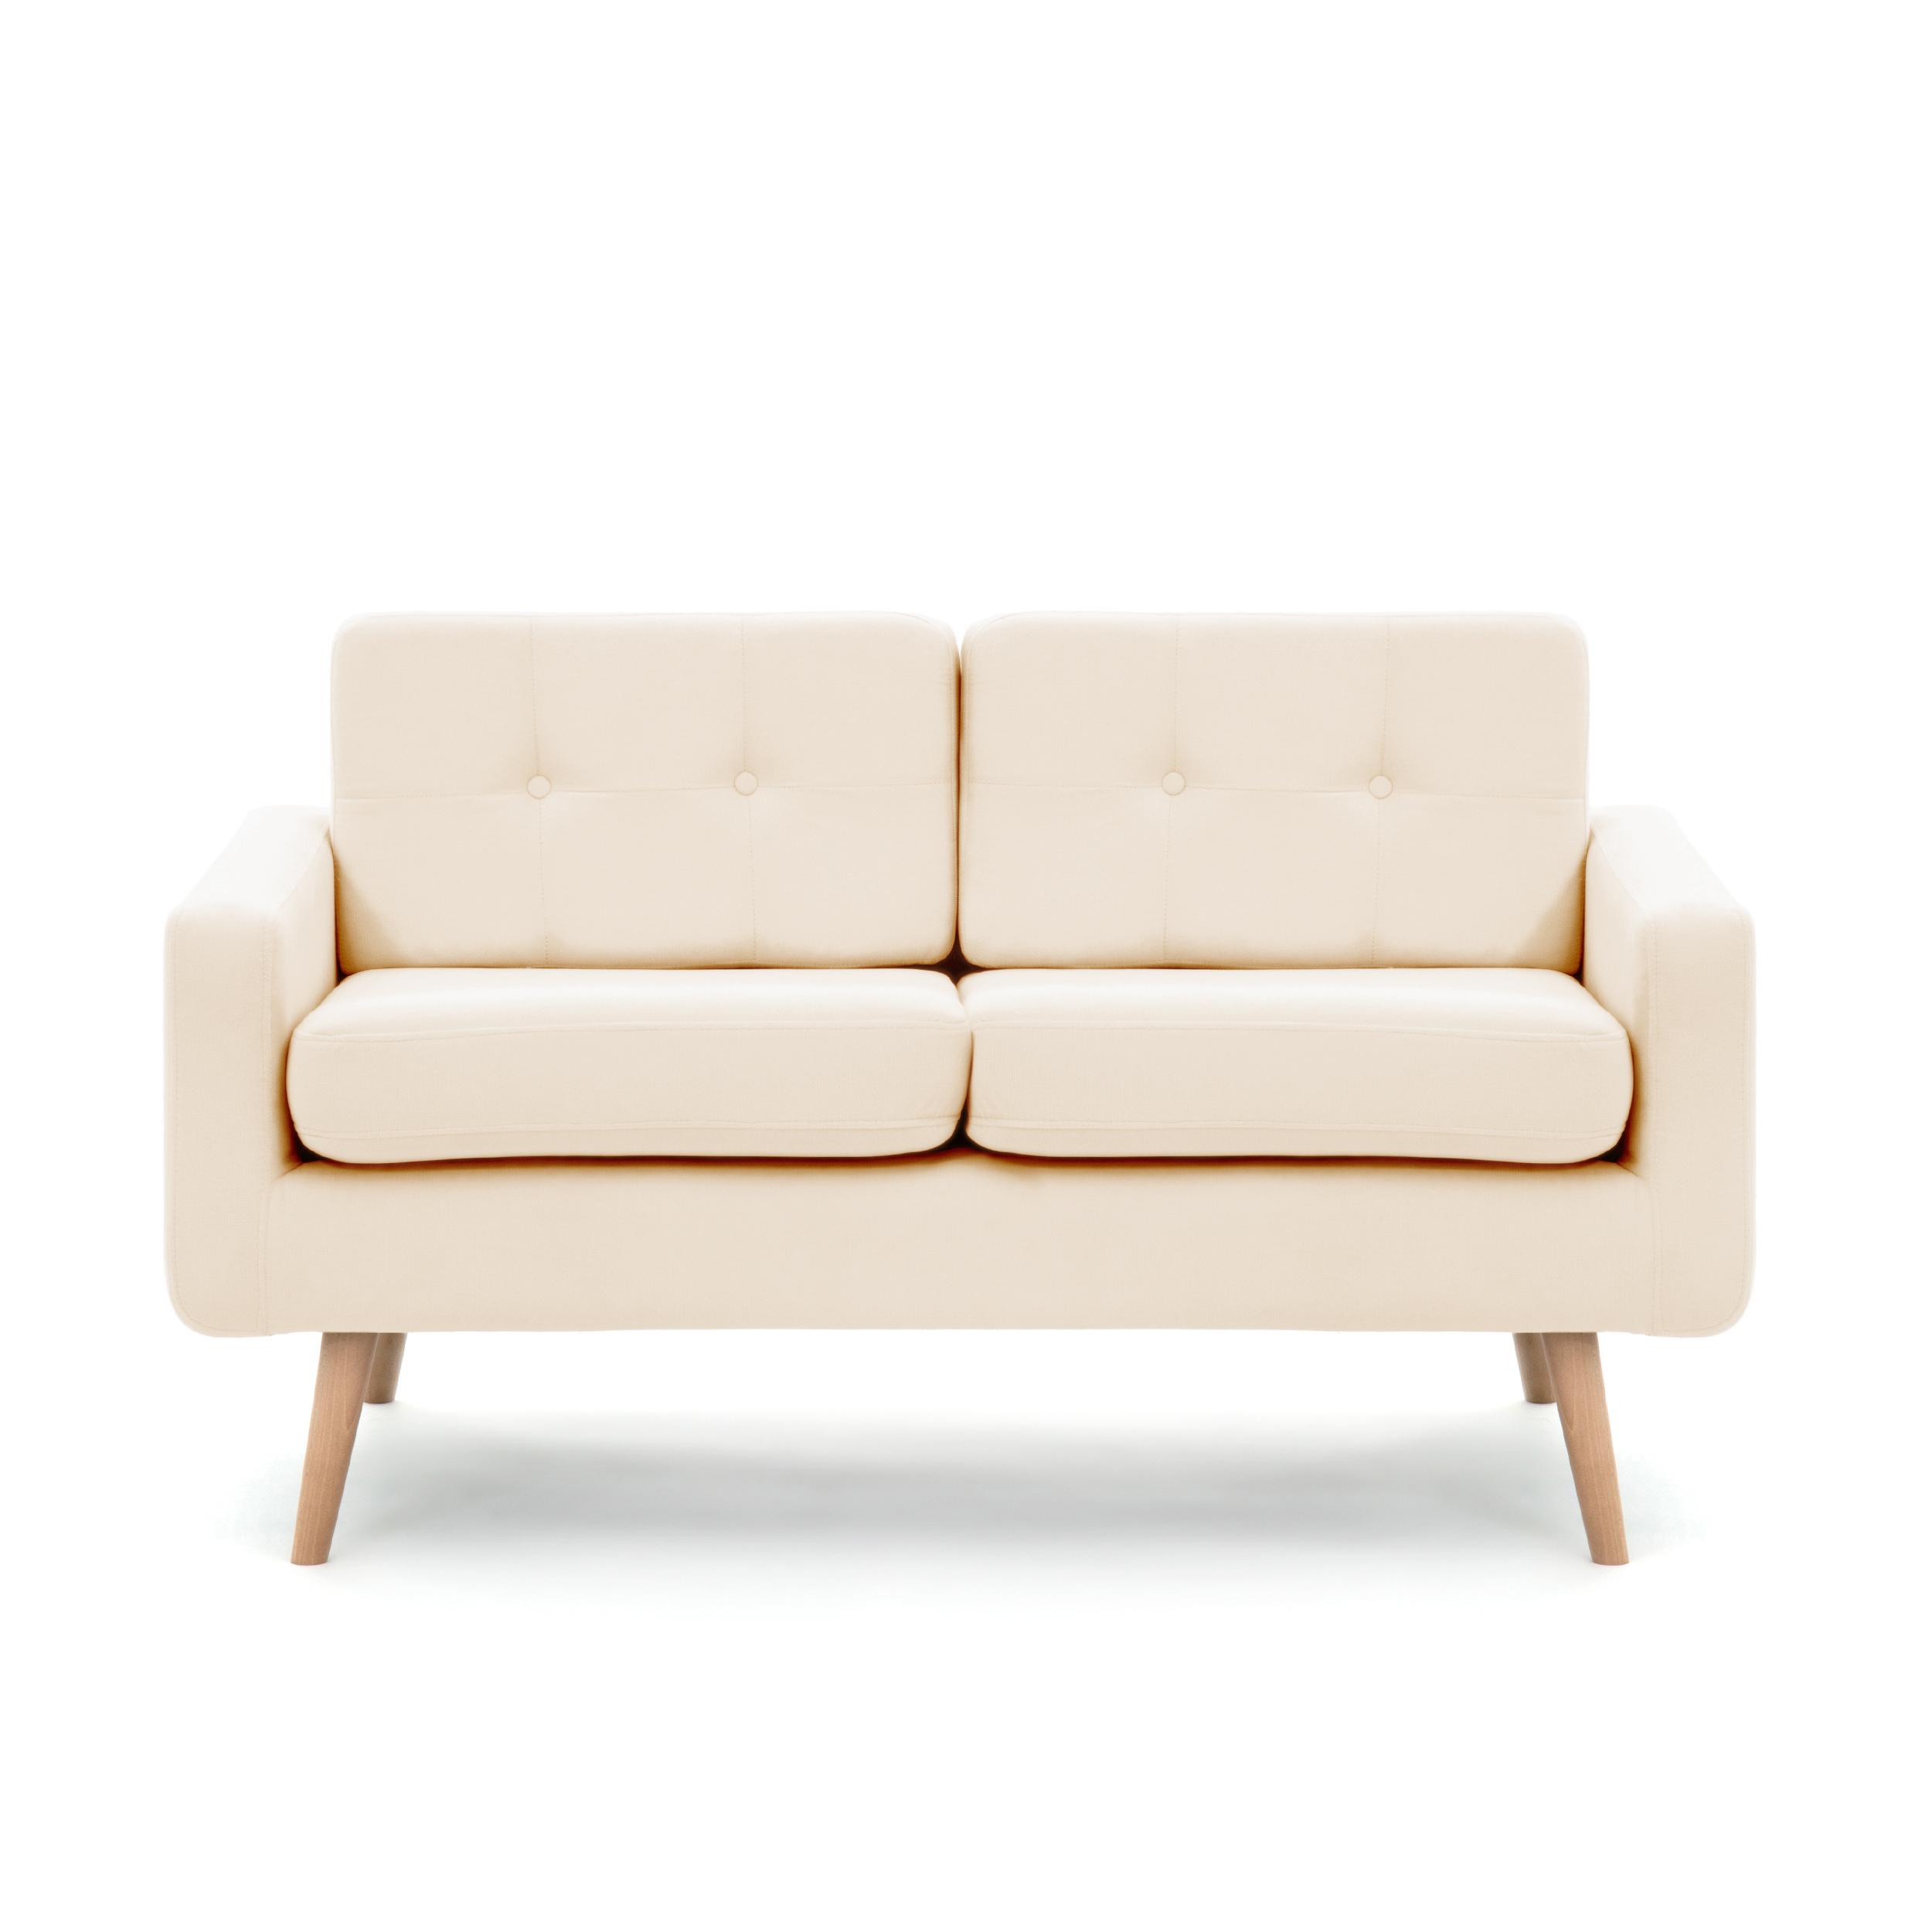 Canapea Fixa 2 locuri Ina Beige